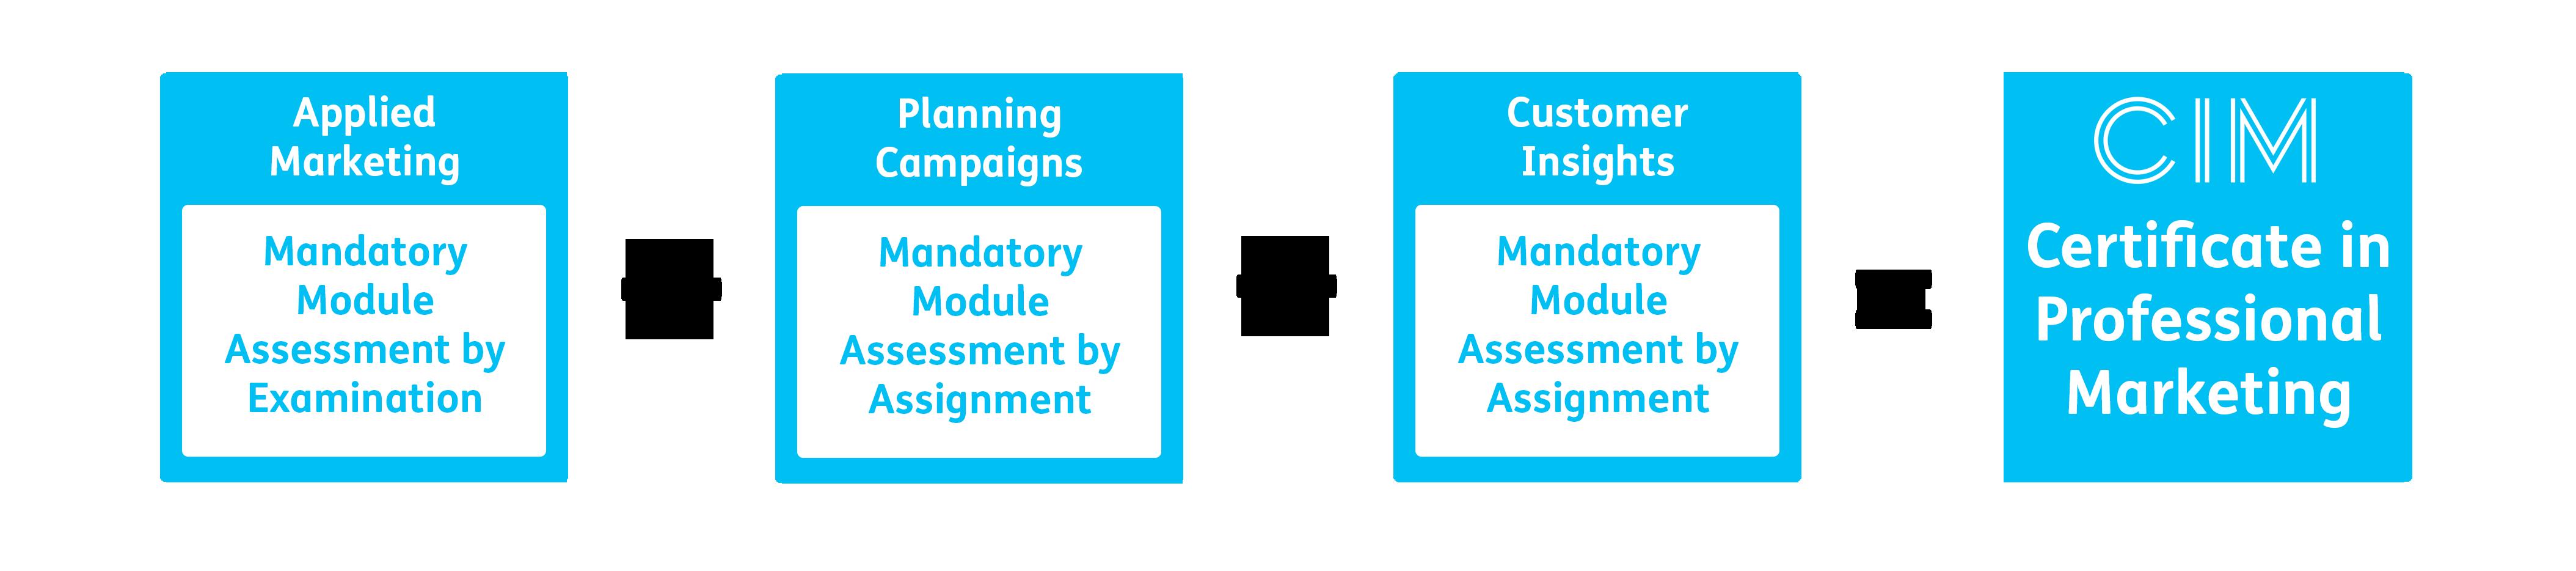 cim-certificate-in-professional-marketing-level-4-19.png